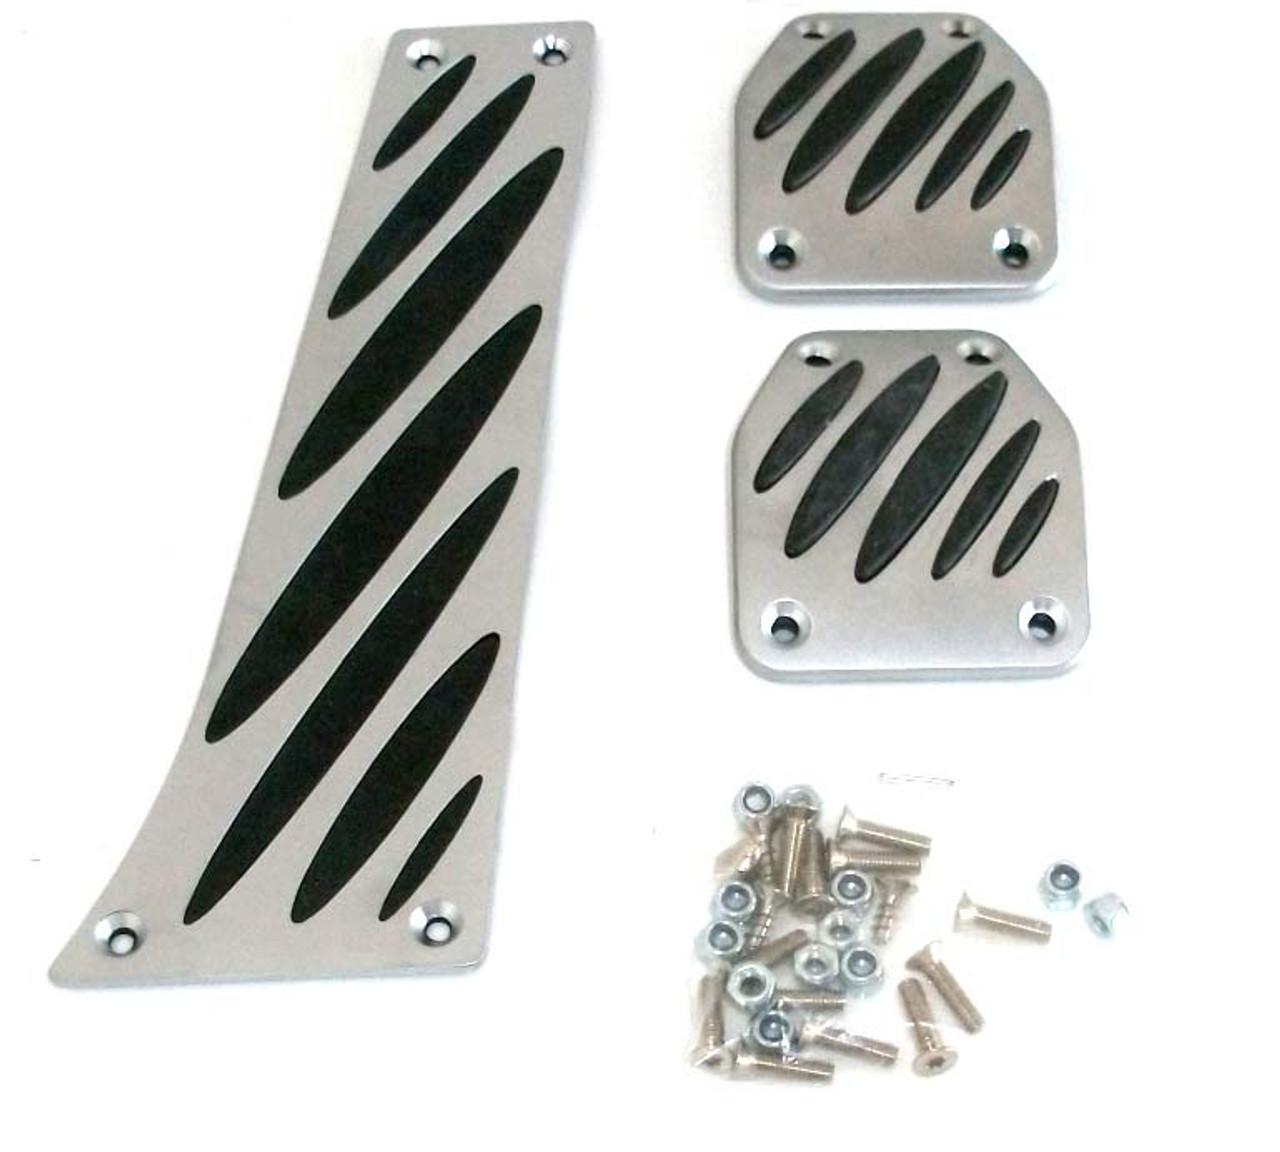 Genuine BMW Aluminum Pedal Pad Overlay Set for Manual Transmission 35002213213